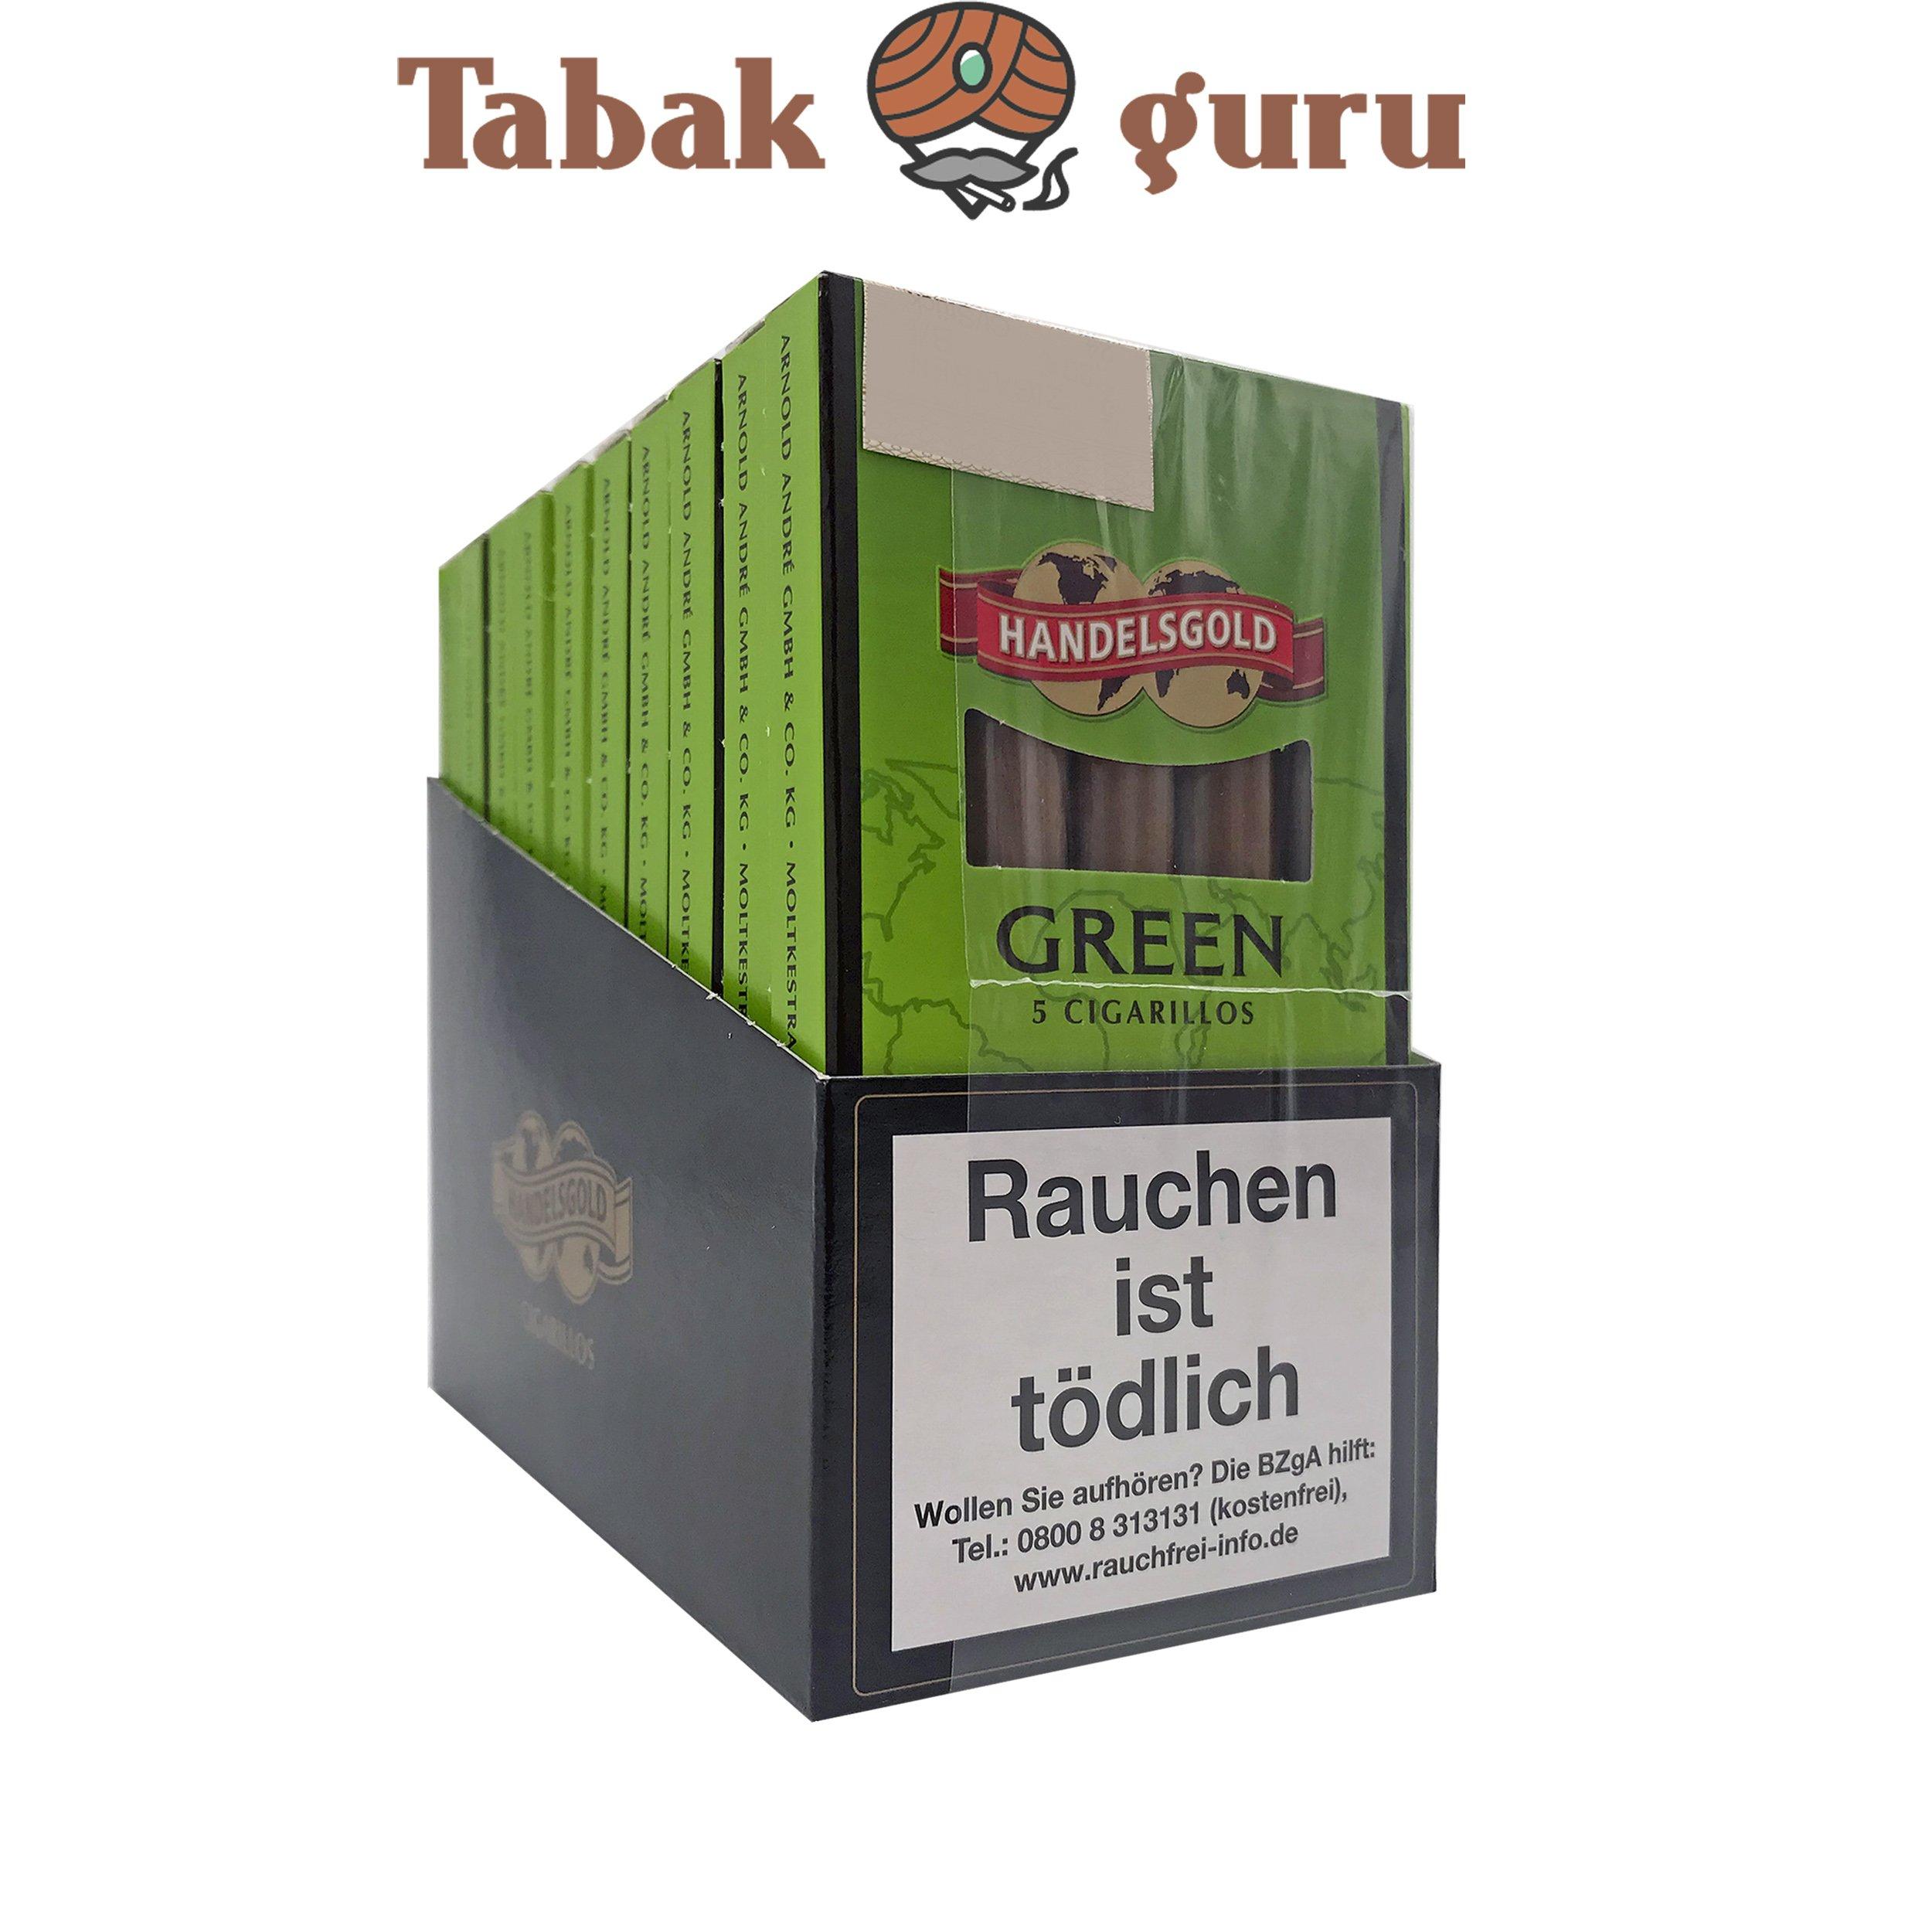 10x Handelsgold No. 205 Green Filterzigarillos à 5 Stück